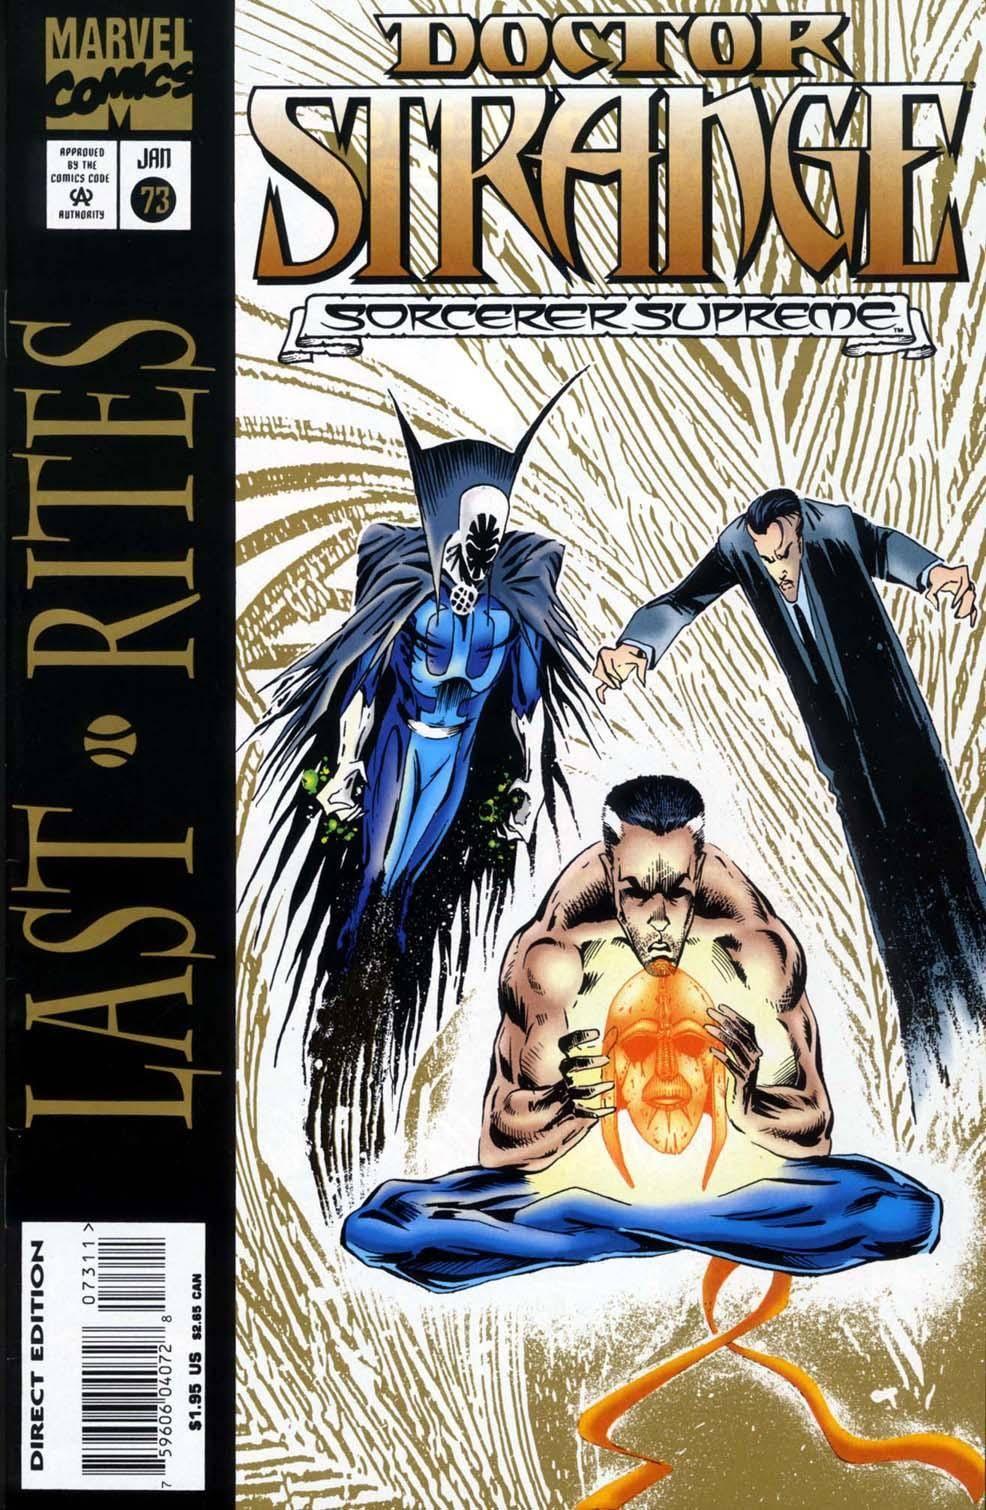 Doctor Strange v3 Sorceror Supreme 73